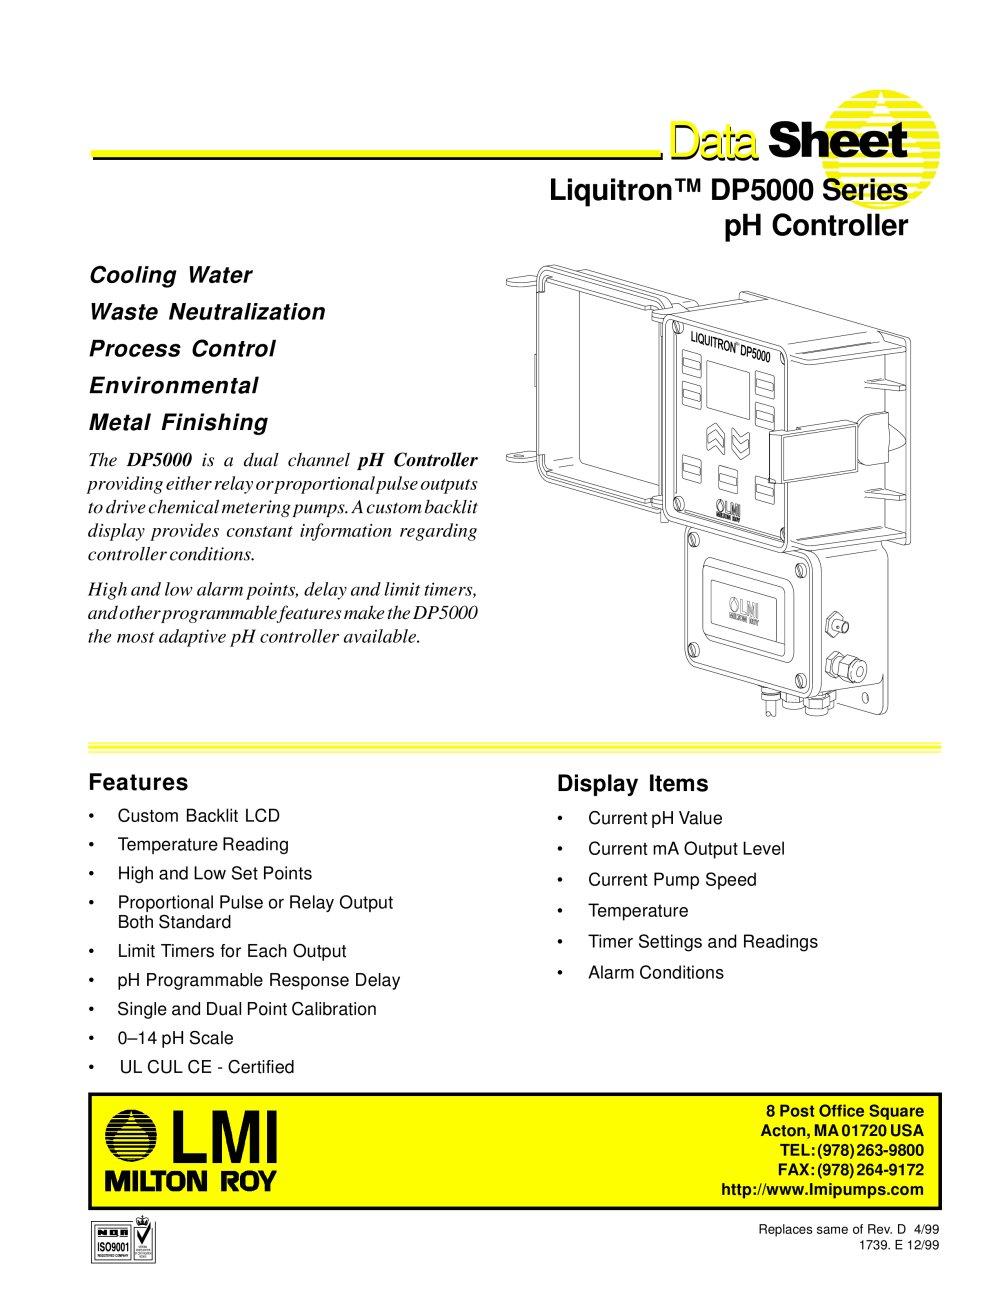 dp5000 lmi milton roy pdf catalogue technical documentation rh pdf directindustry com LMI Pump Catalog LMI Chemical Pumps Parts